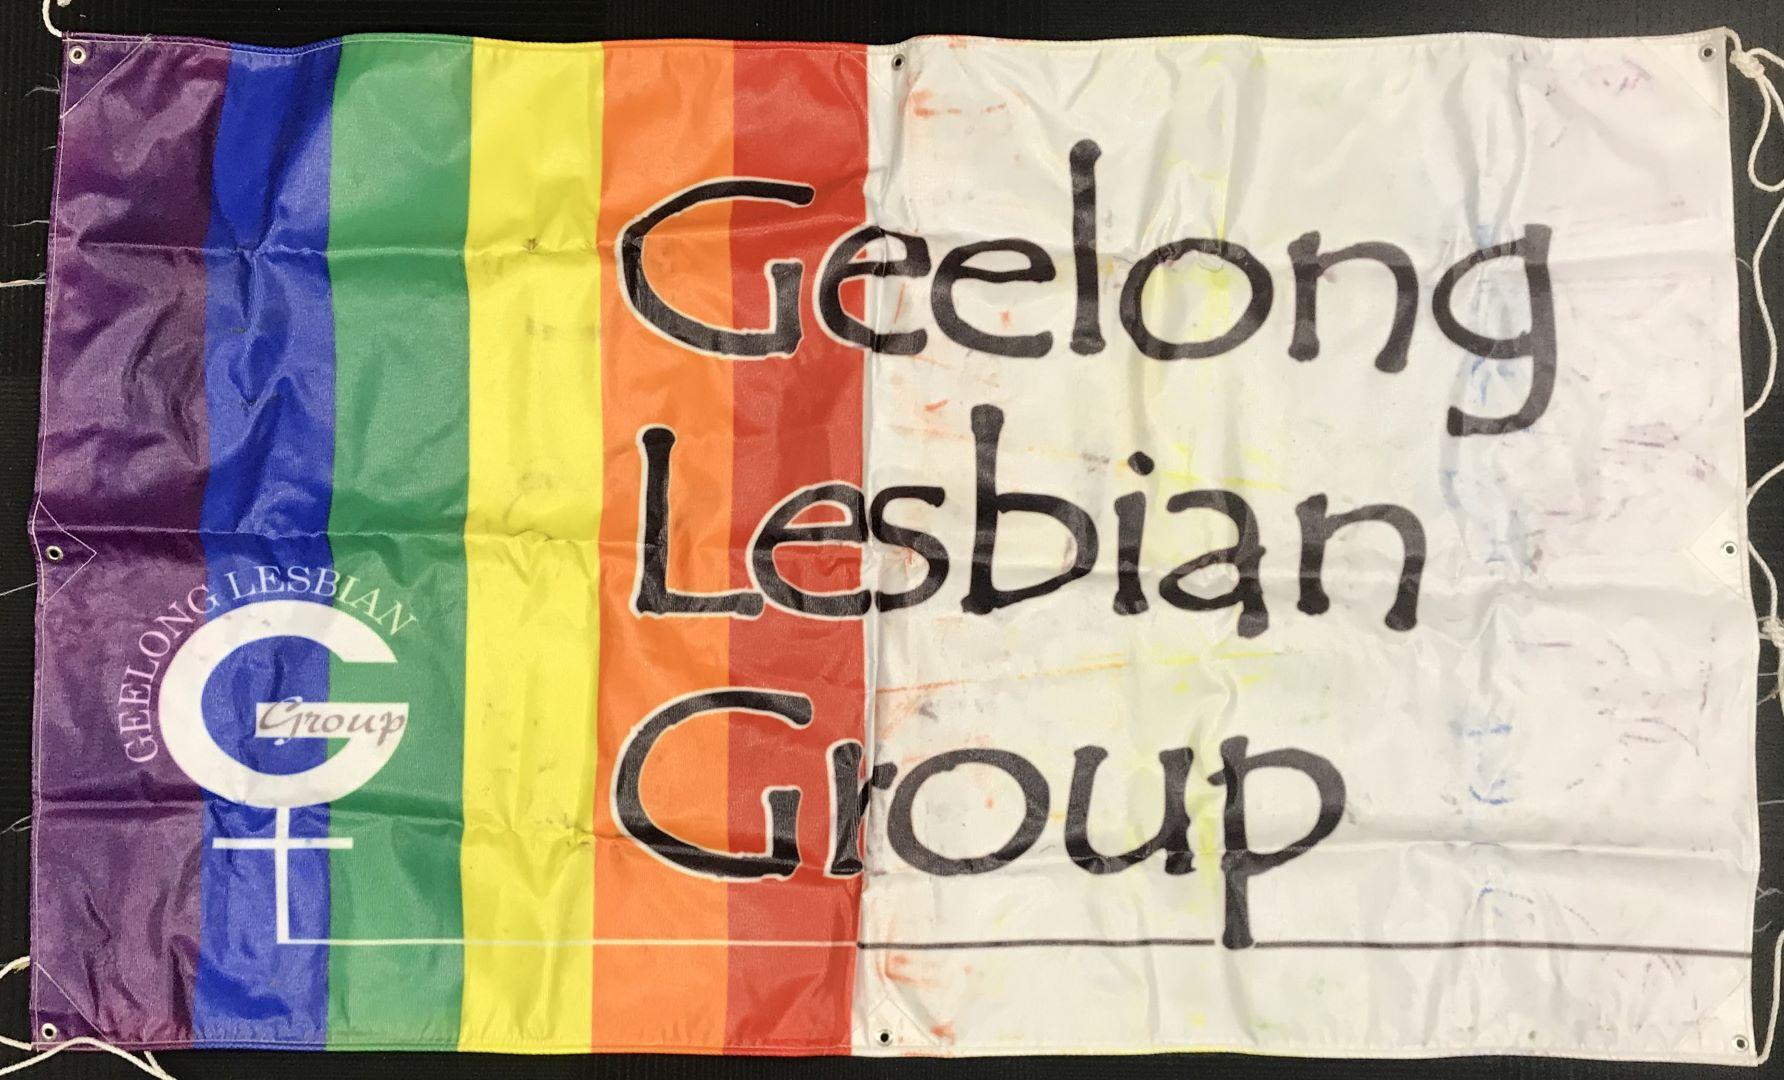 Geelong Lesbian Group - Geelong, Vic, Australia, [200?]